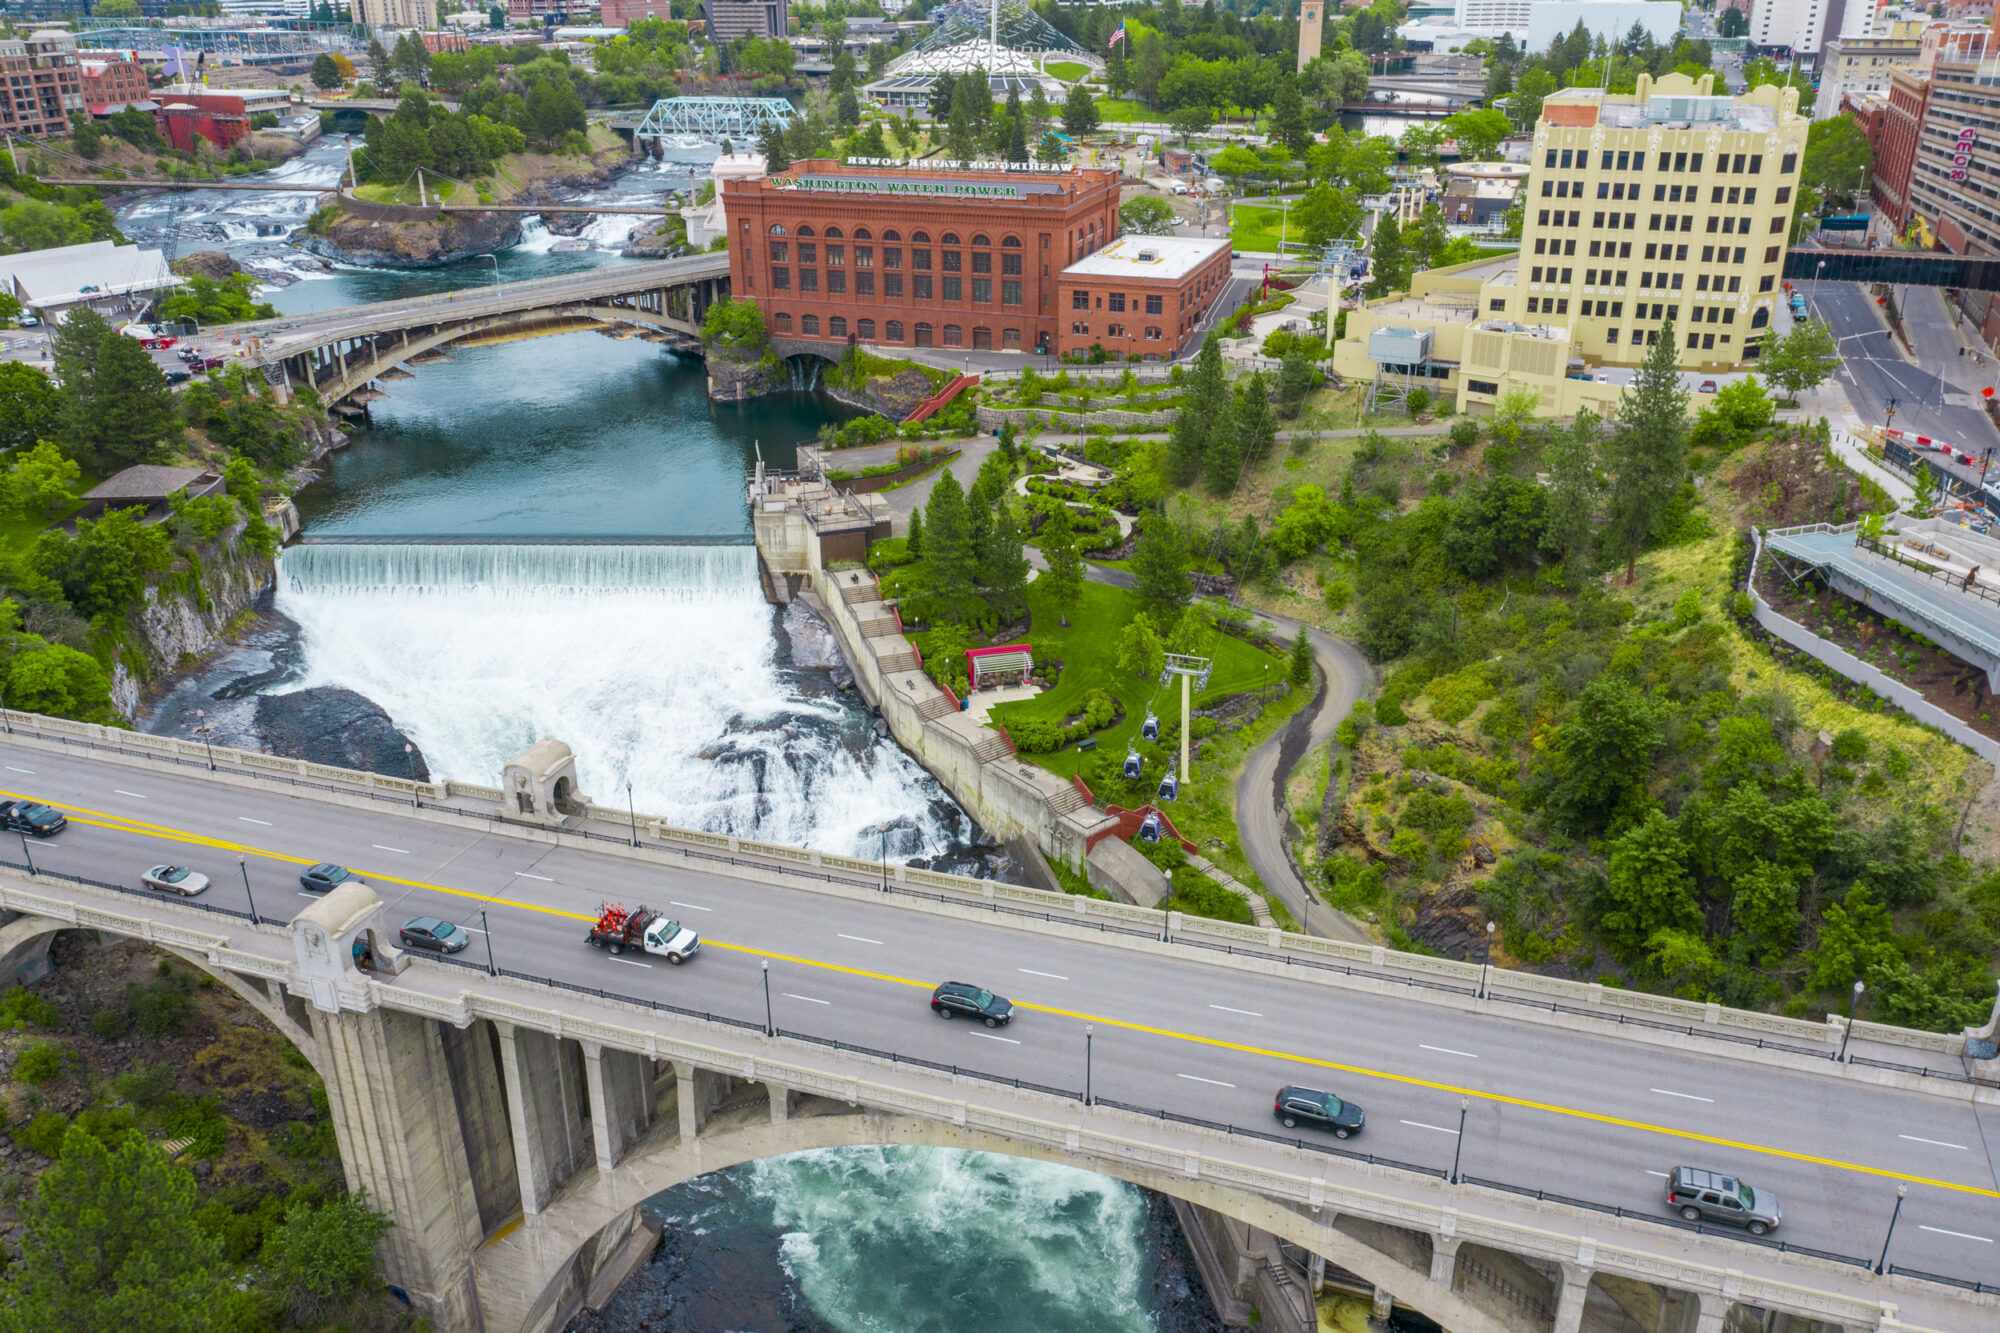 Downtown Spokane River Waterfall Aerial